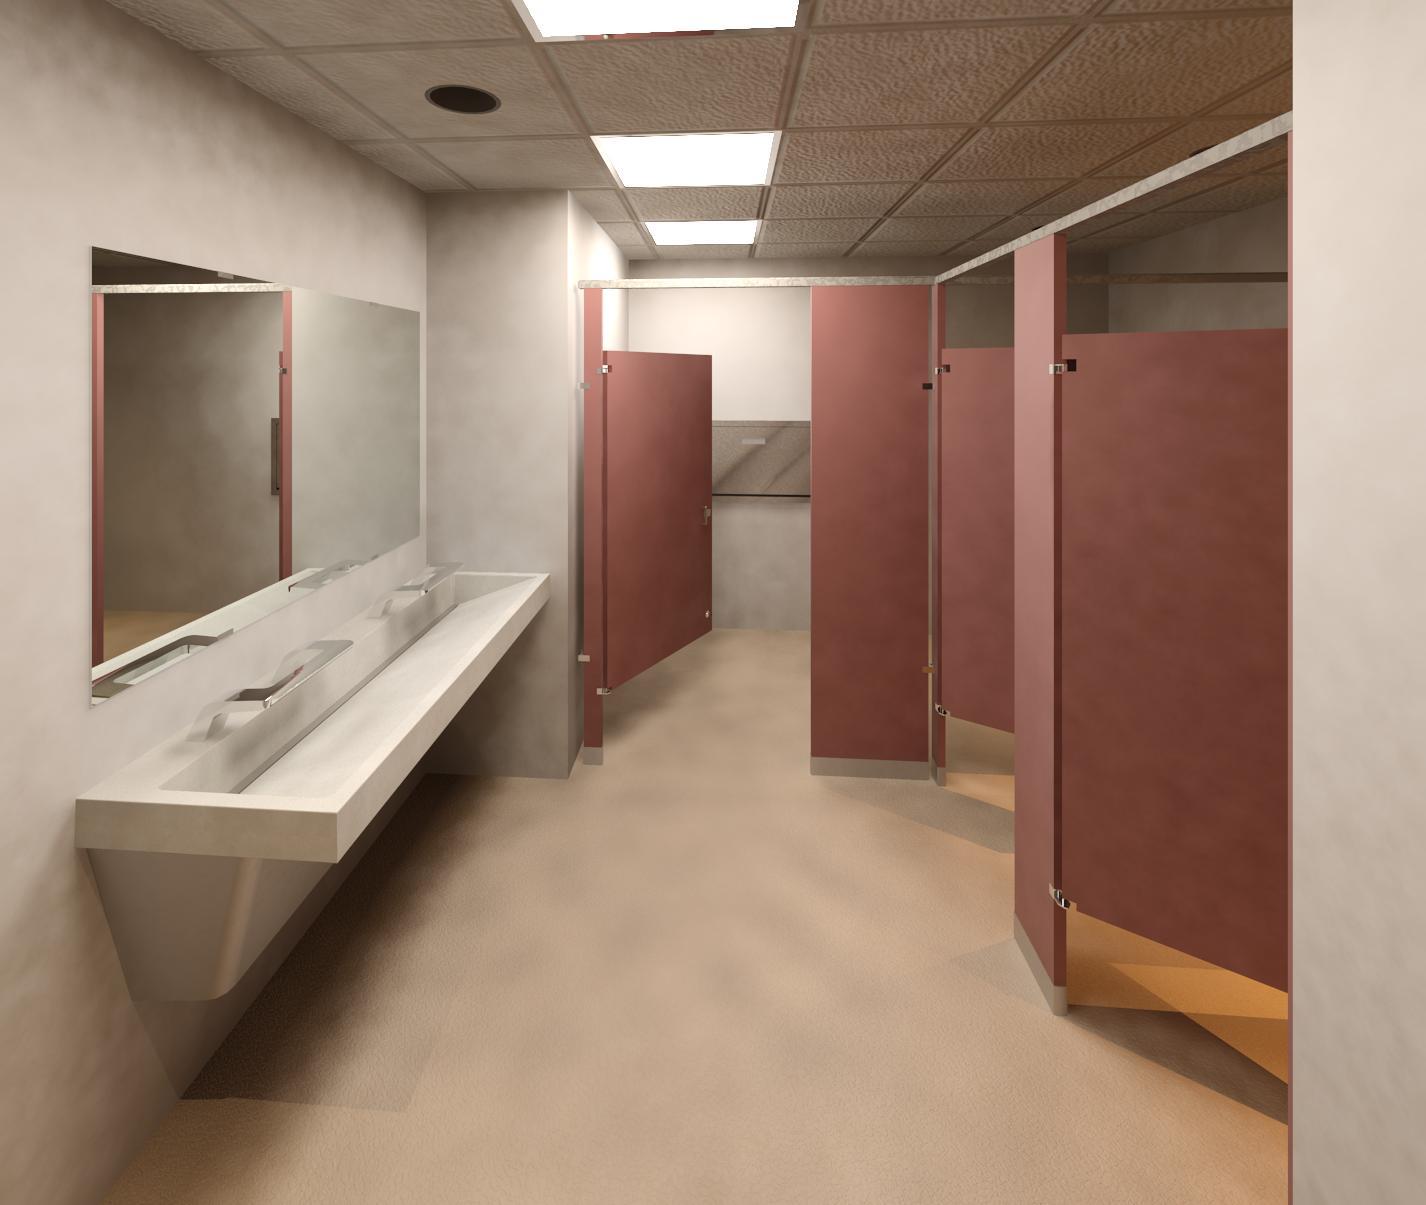 Bradley Toilet Room Bradley Verge LVQ with WashBar 2-Station Powder Coat Partitions